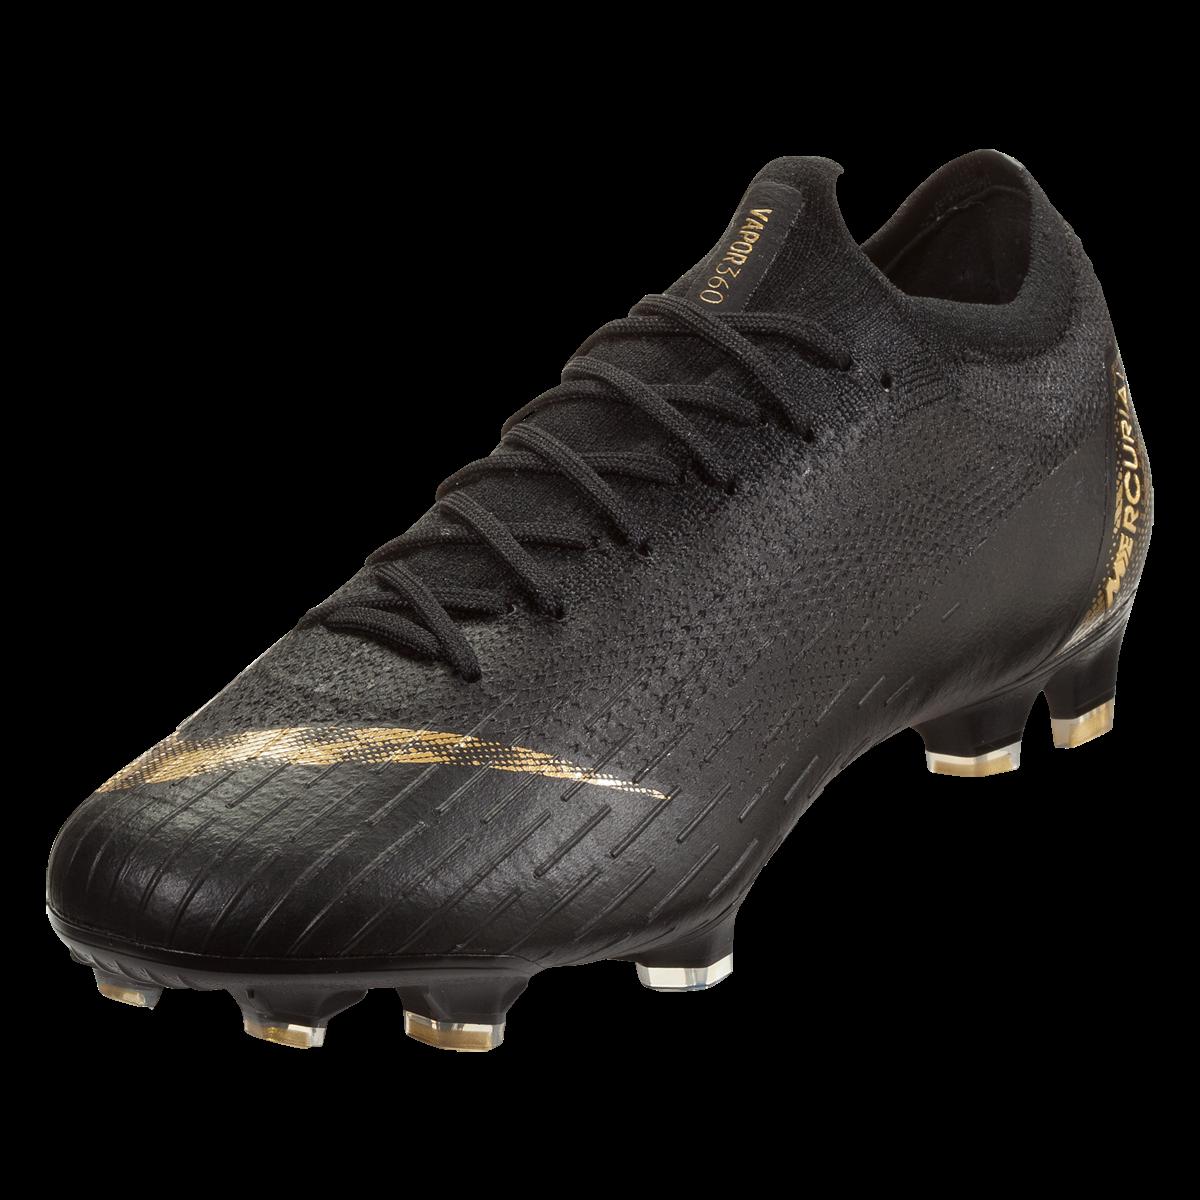 Nike Mercurial Vapor Xii Elite Fg Soccer Cleat Black Metallic Gold 4 5 Chuteiras